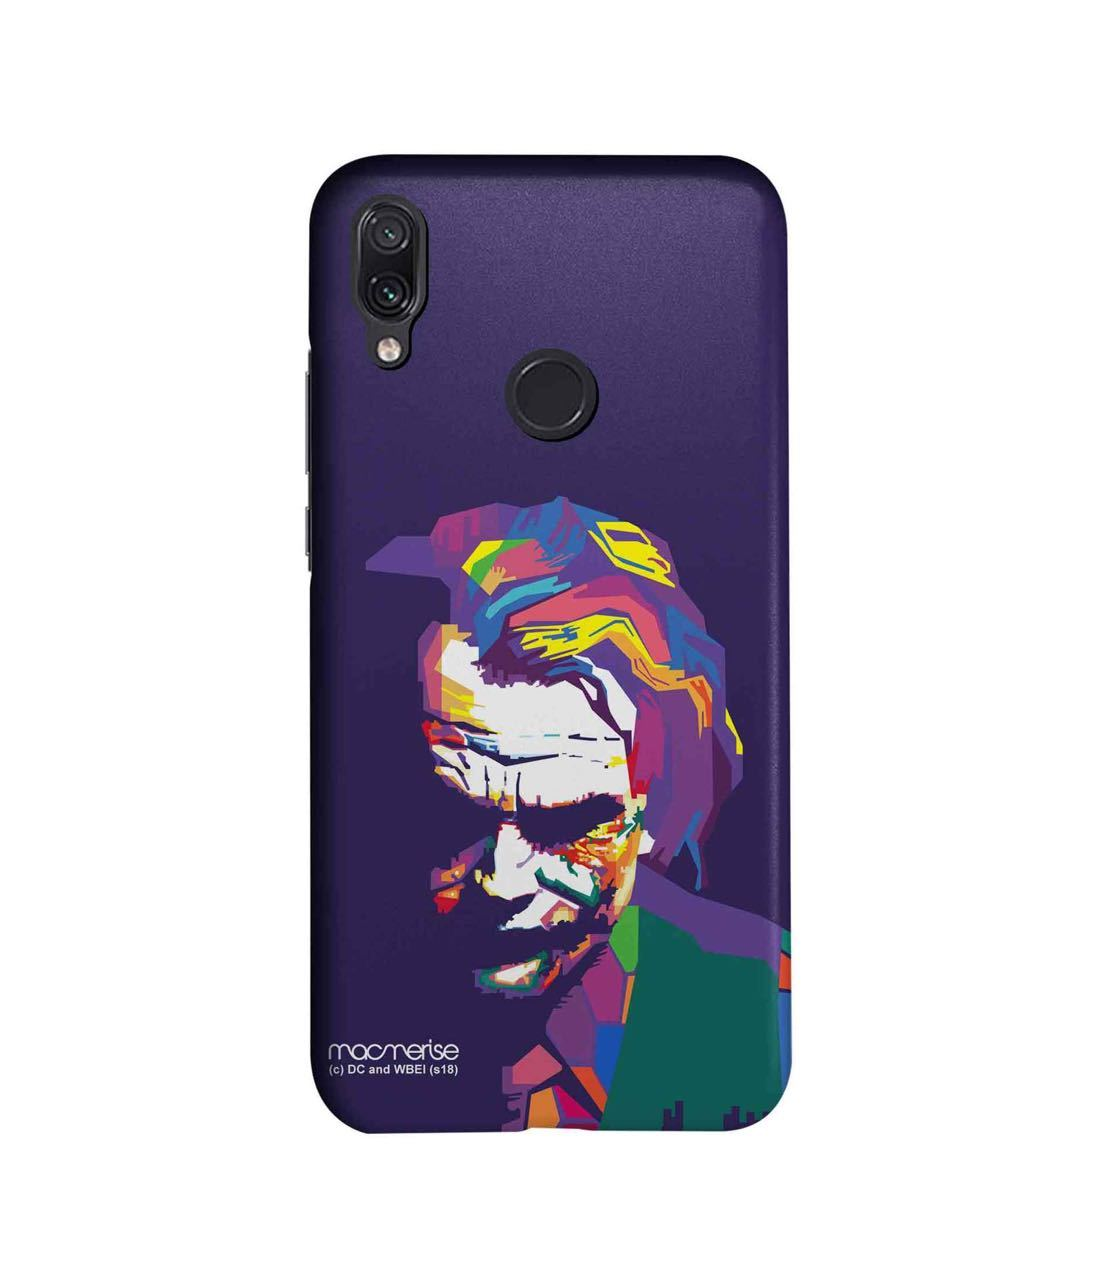 Joker Art - Sleek Phone Case for Xiaomi Redmi Note 7 Pro